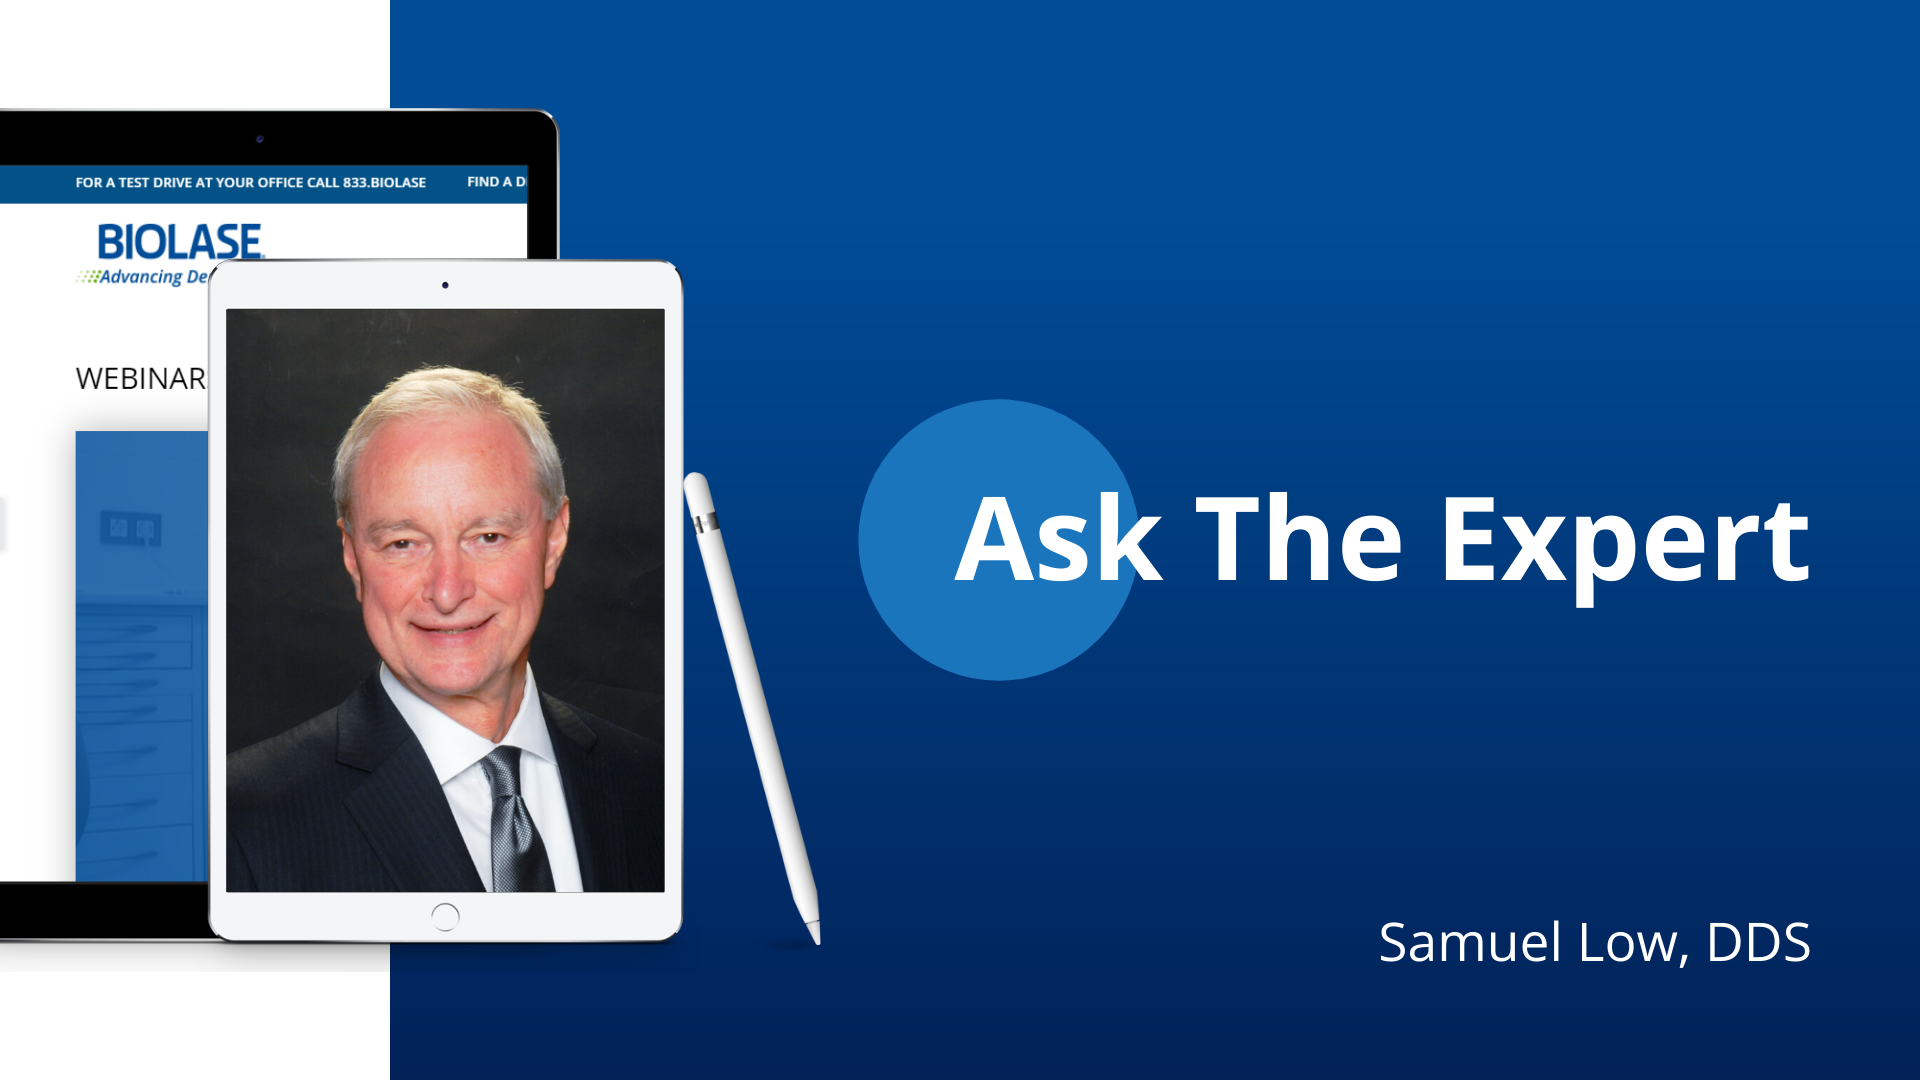 ask-expert-low